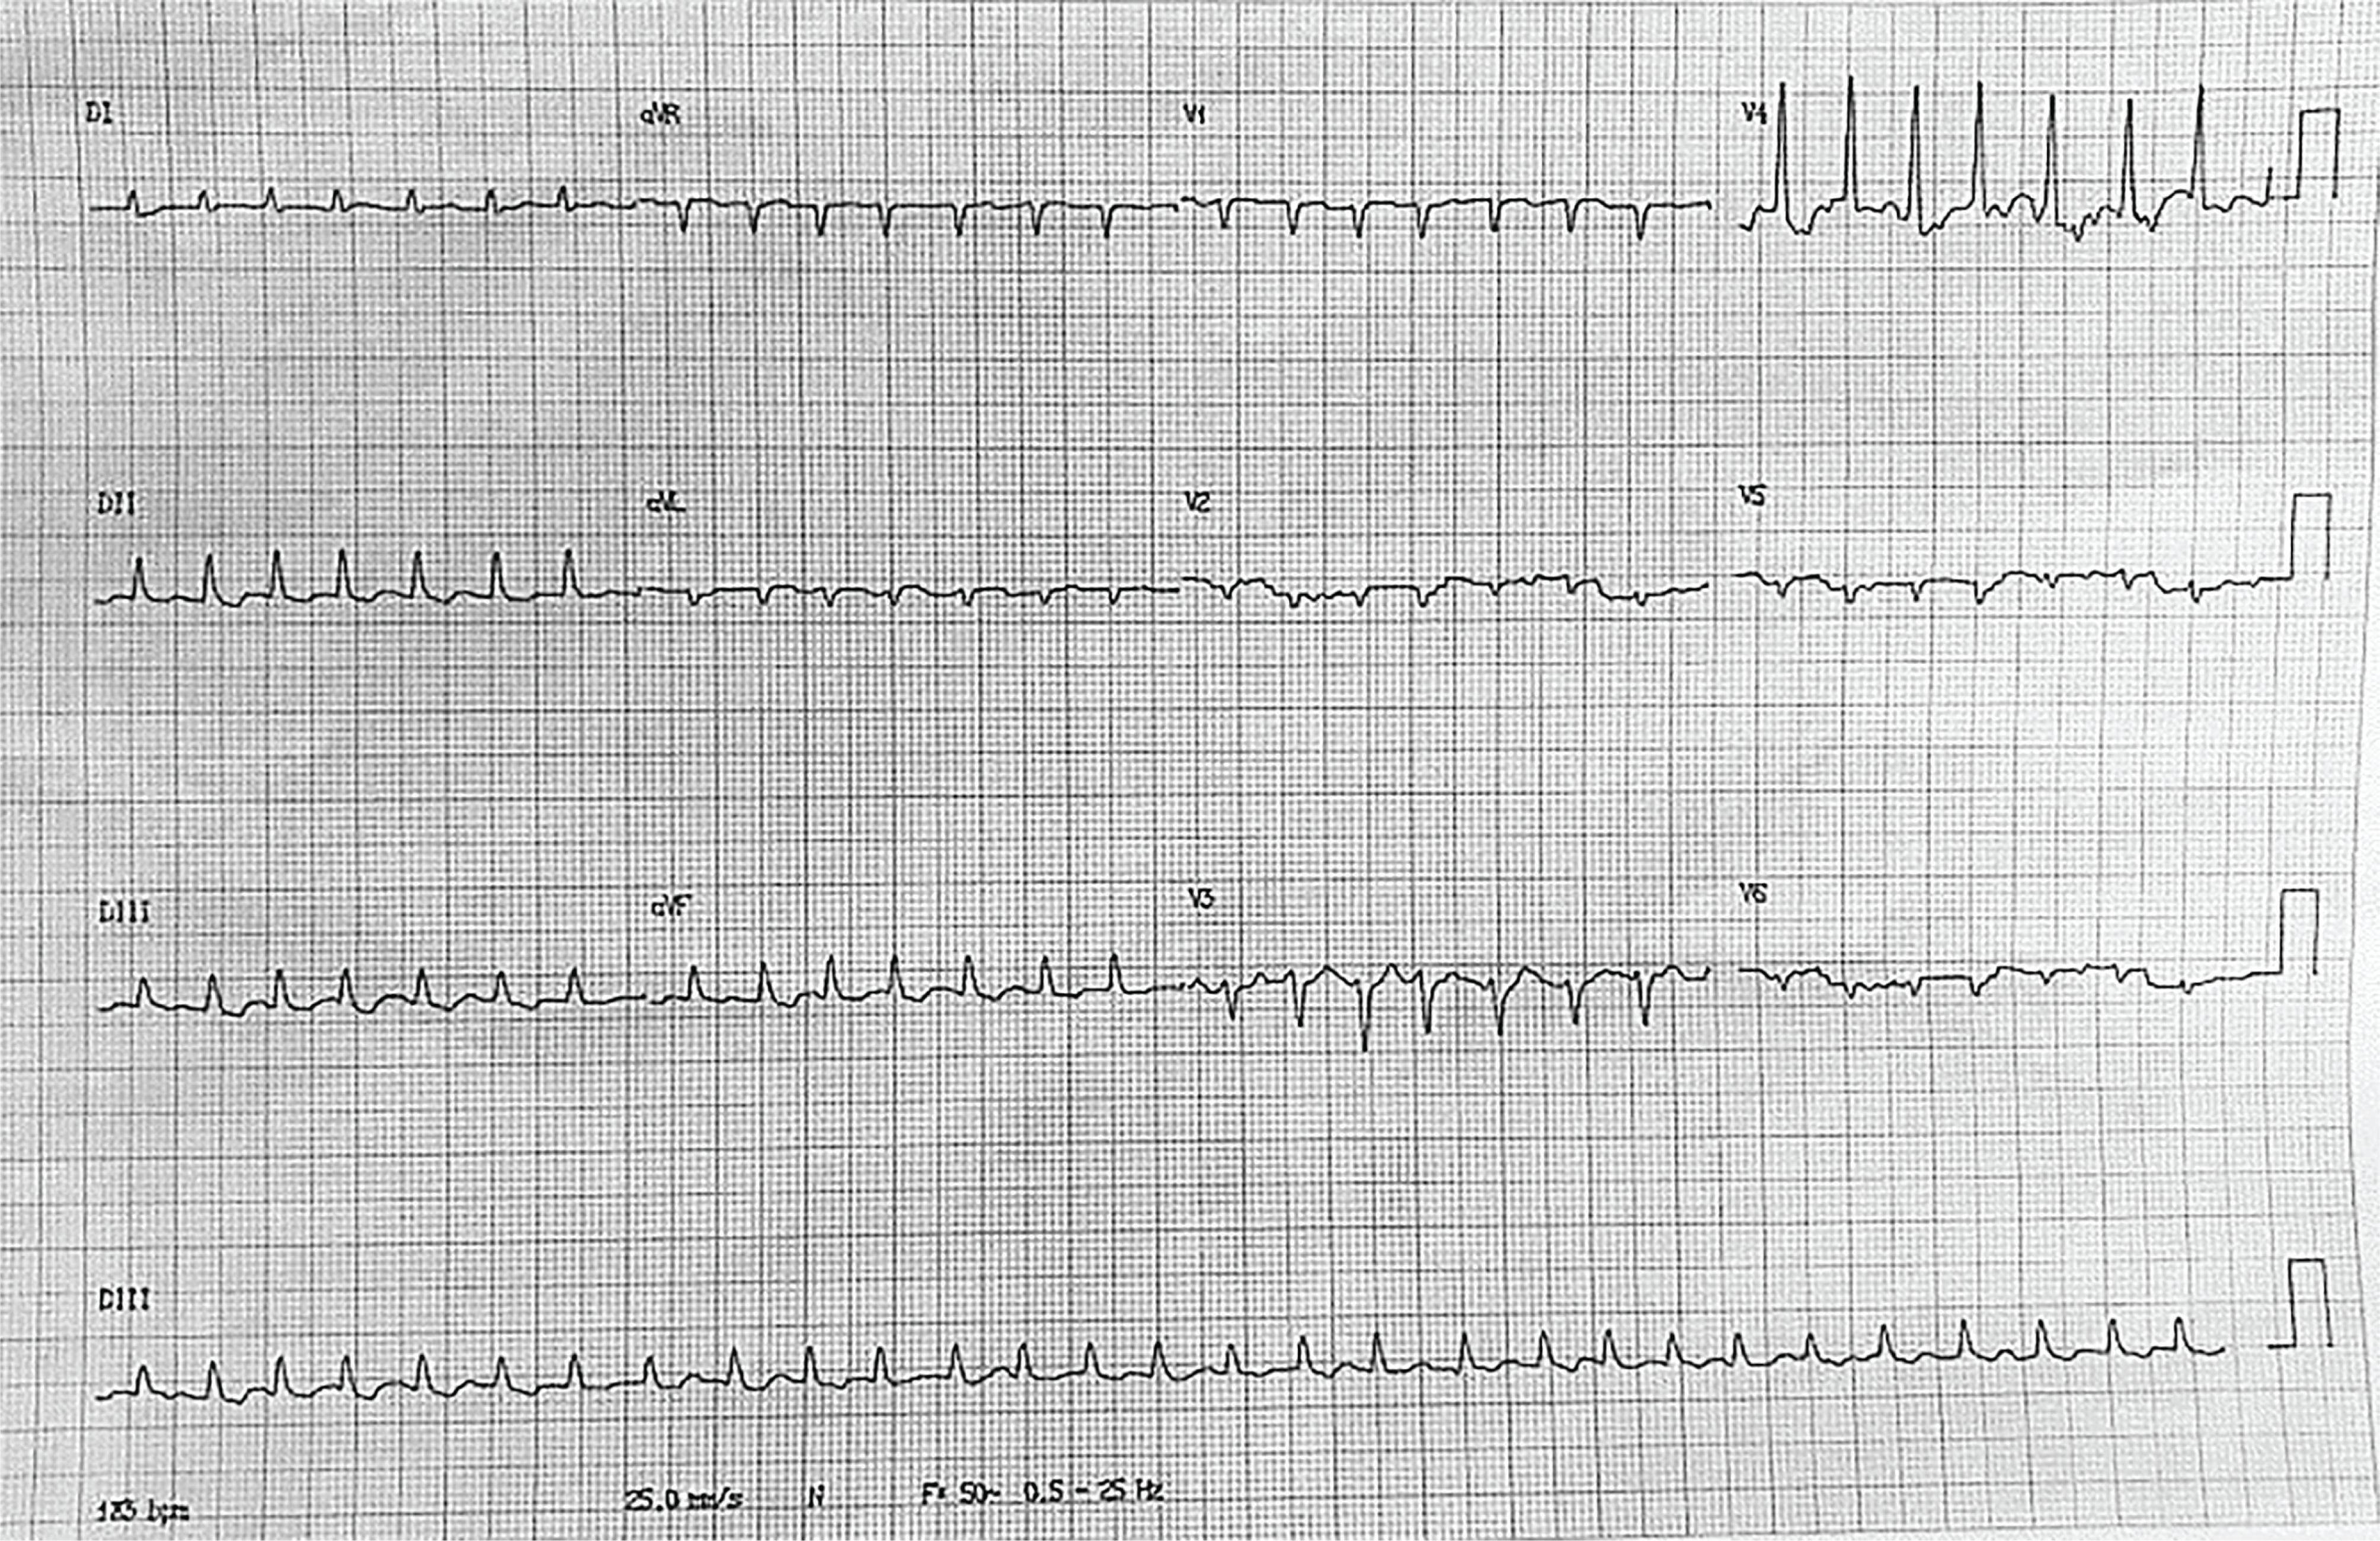 Atrial fibrillation present on the ECG.